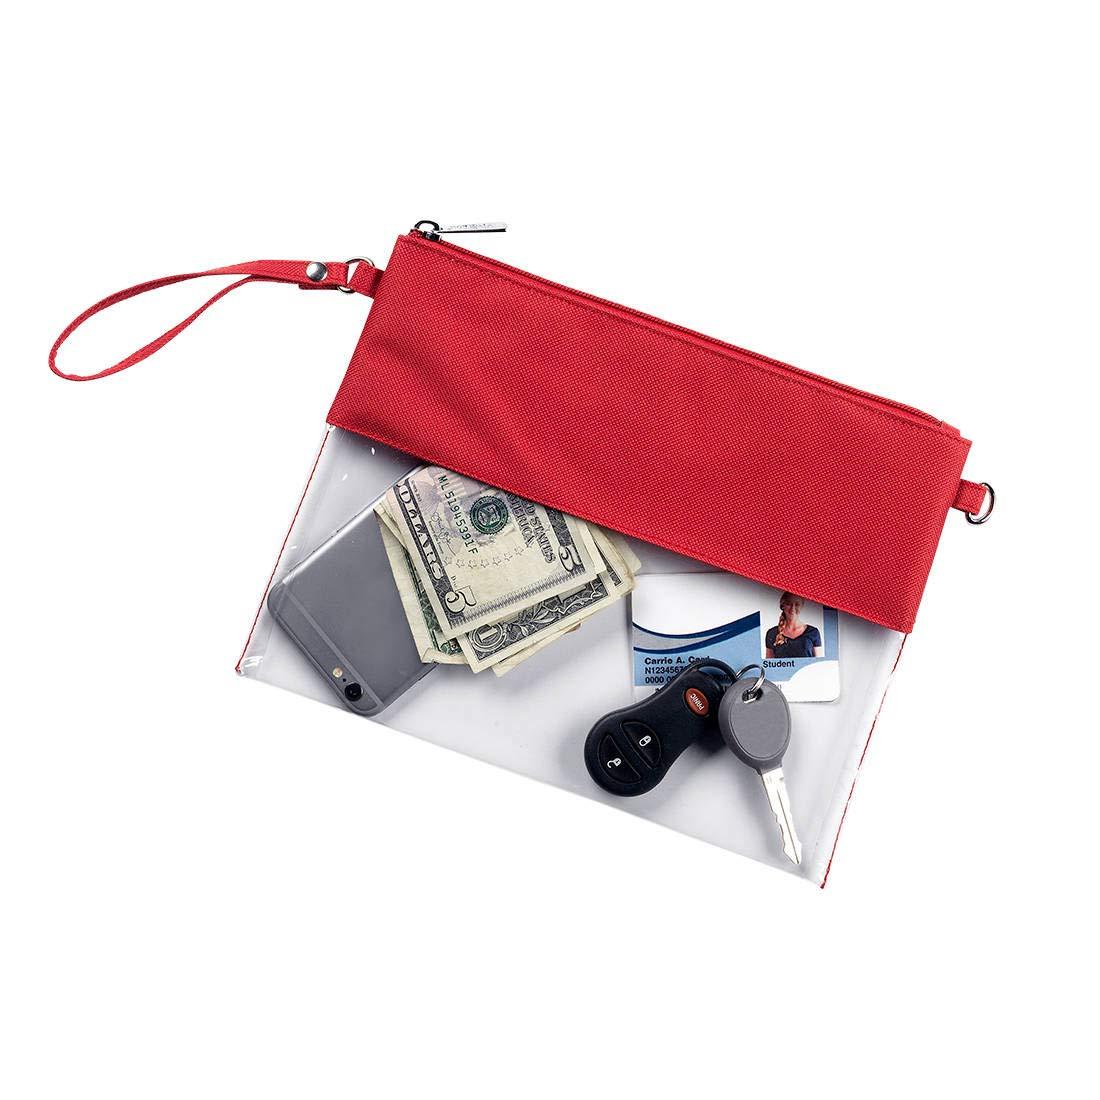 Amazon.com: MONOBLANKS Bolso cruzado ajustable con correa ...